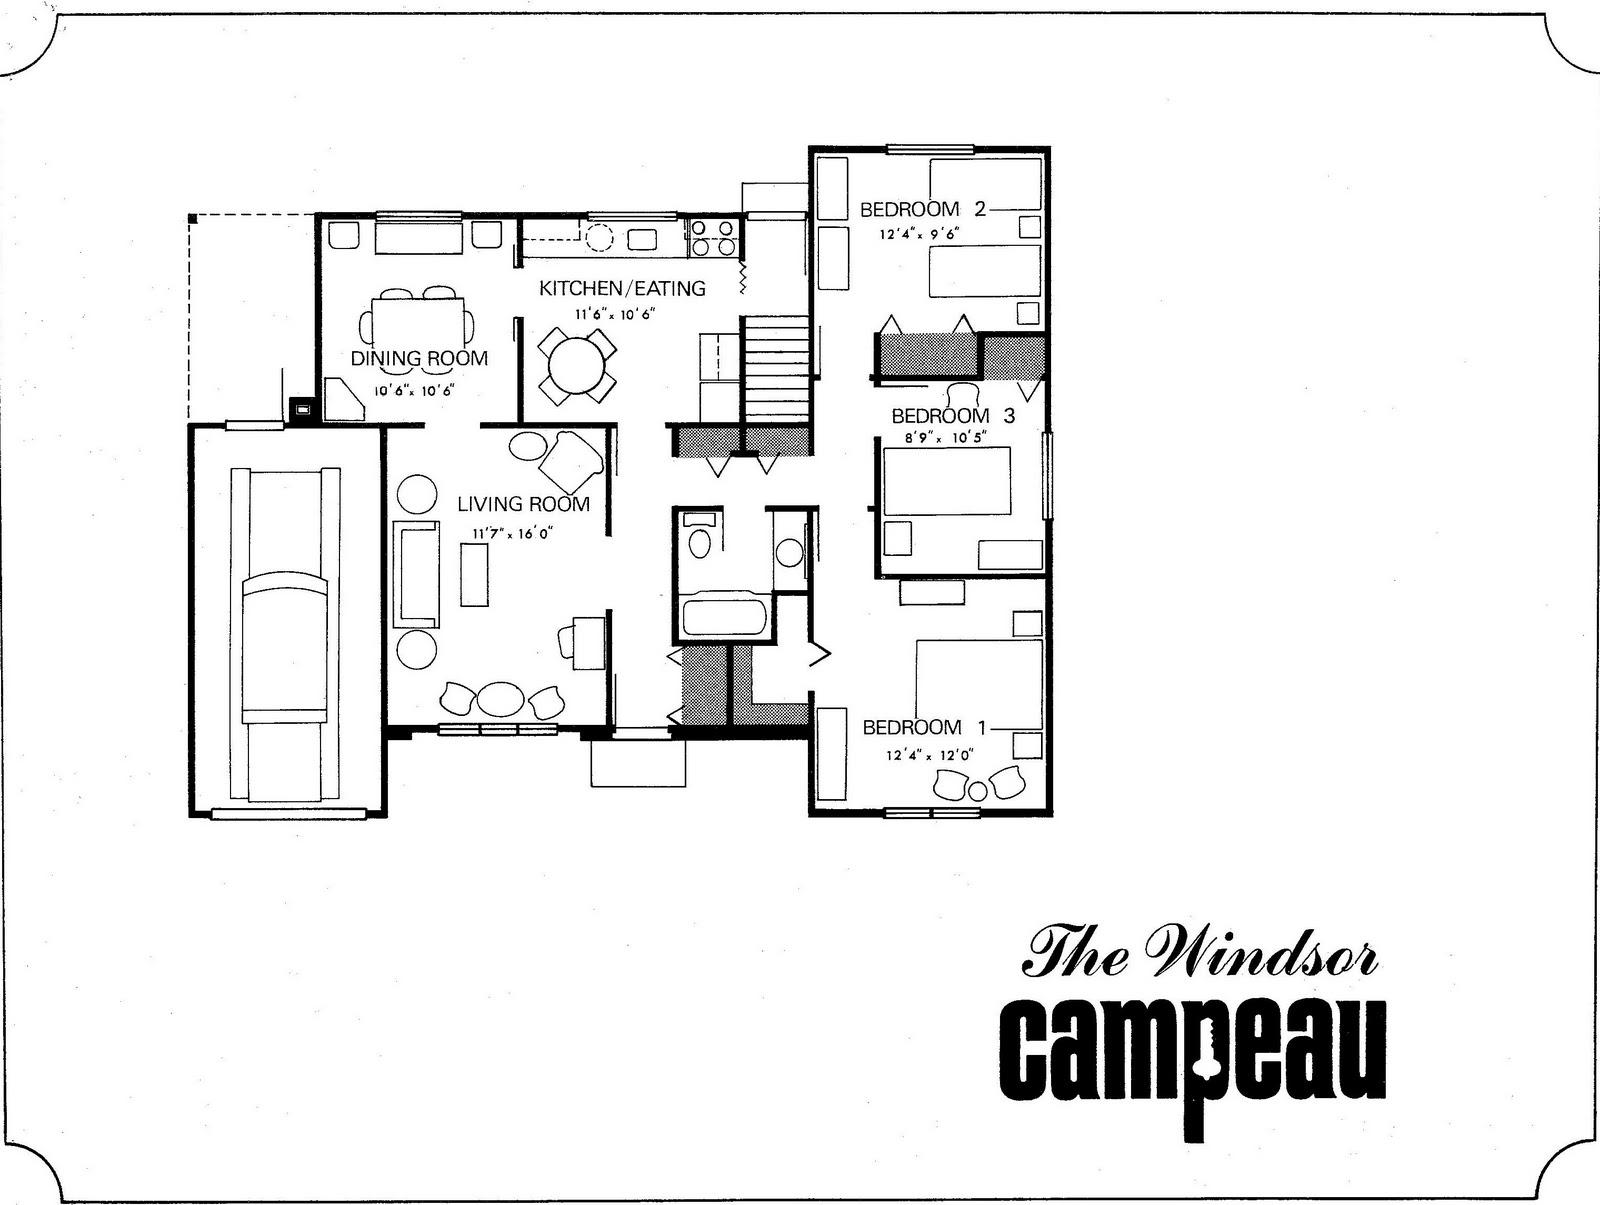 Backsplit Floor Plans Mid Century Modern And 1970s Era Ottawa Neighbourhood